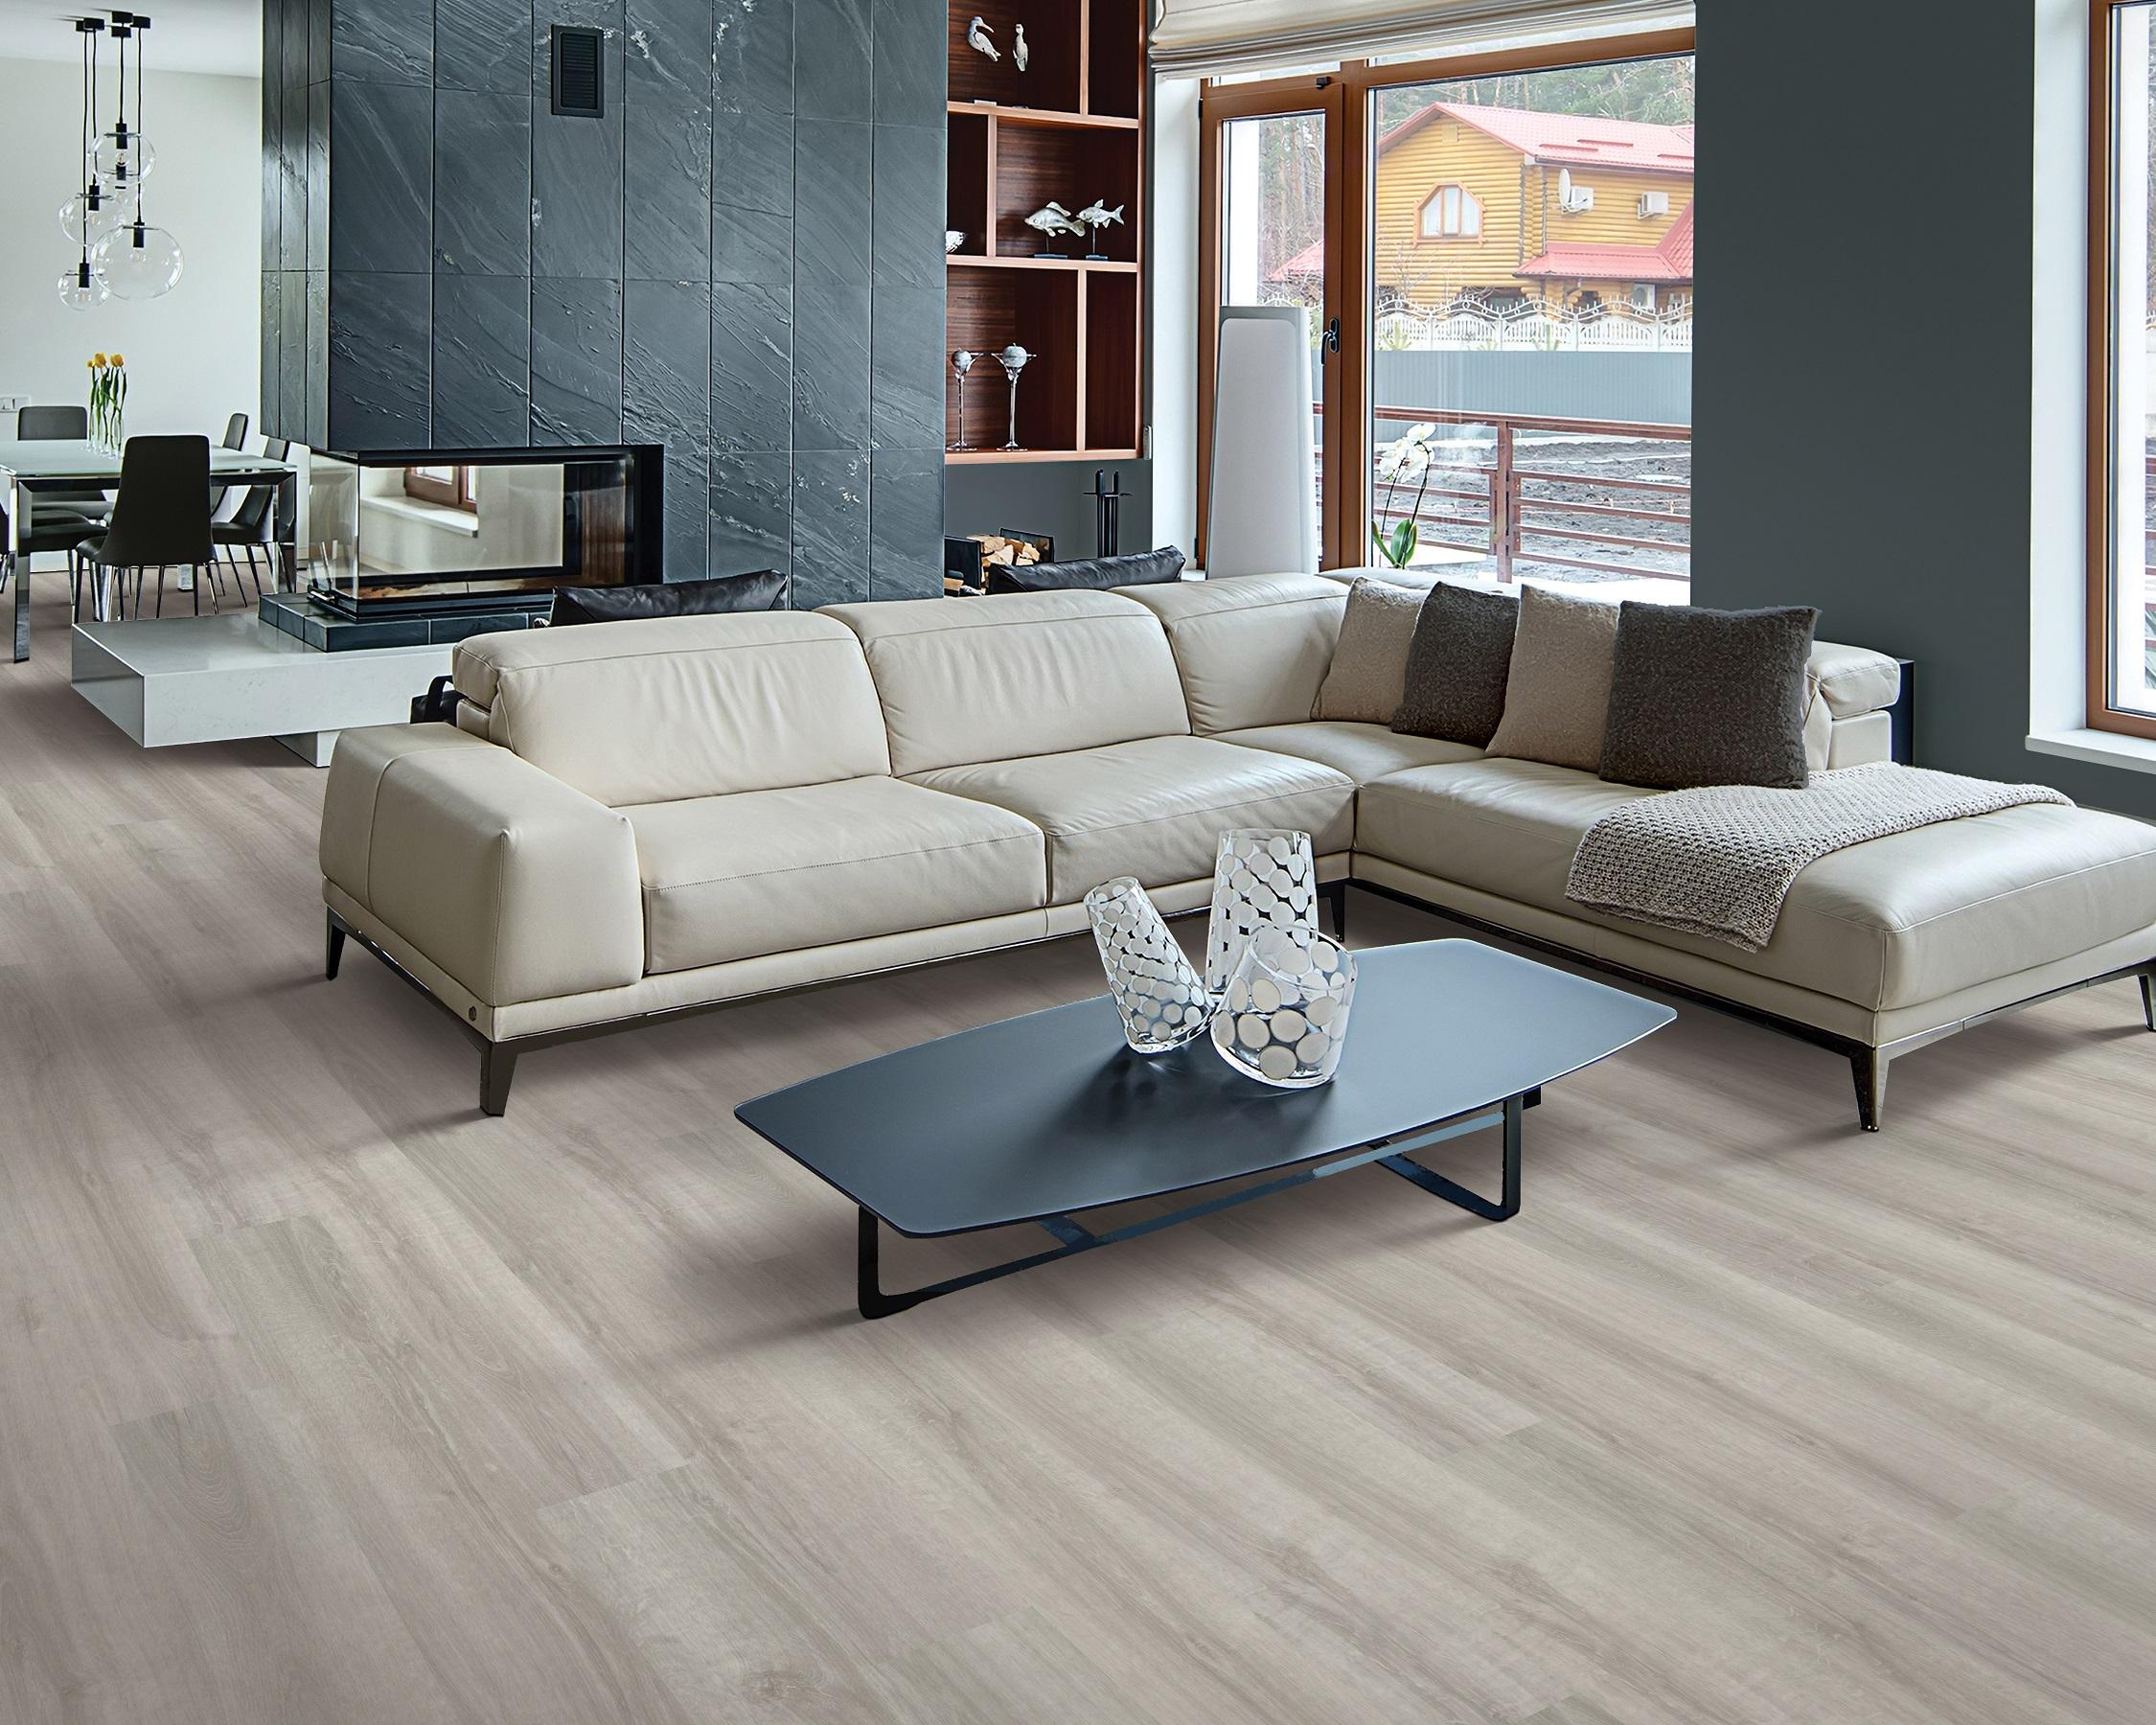 Clean vinyl plank flooring in a Maple Ridge, BC home